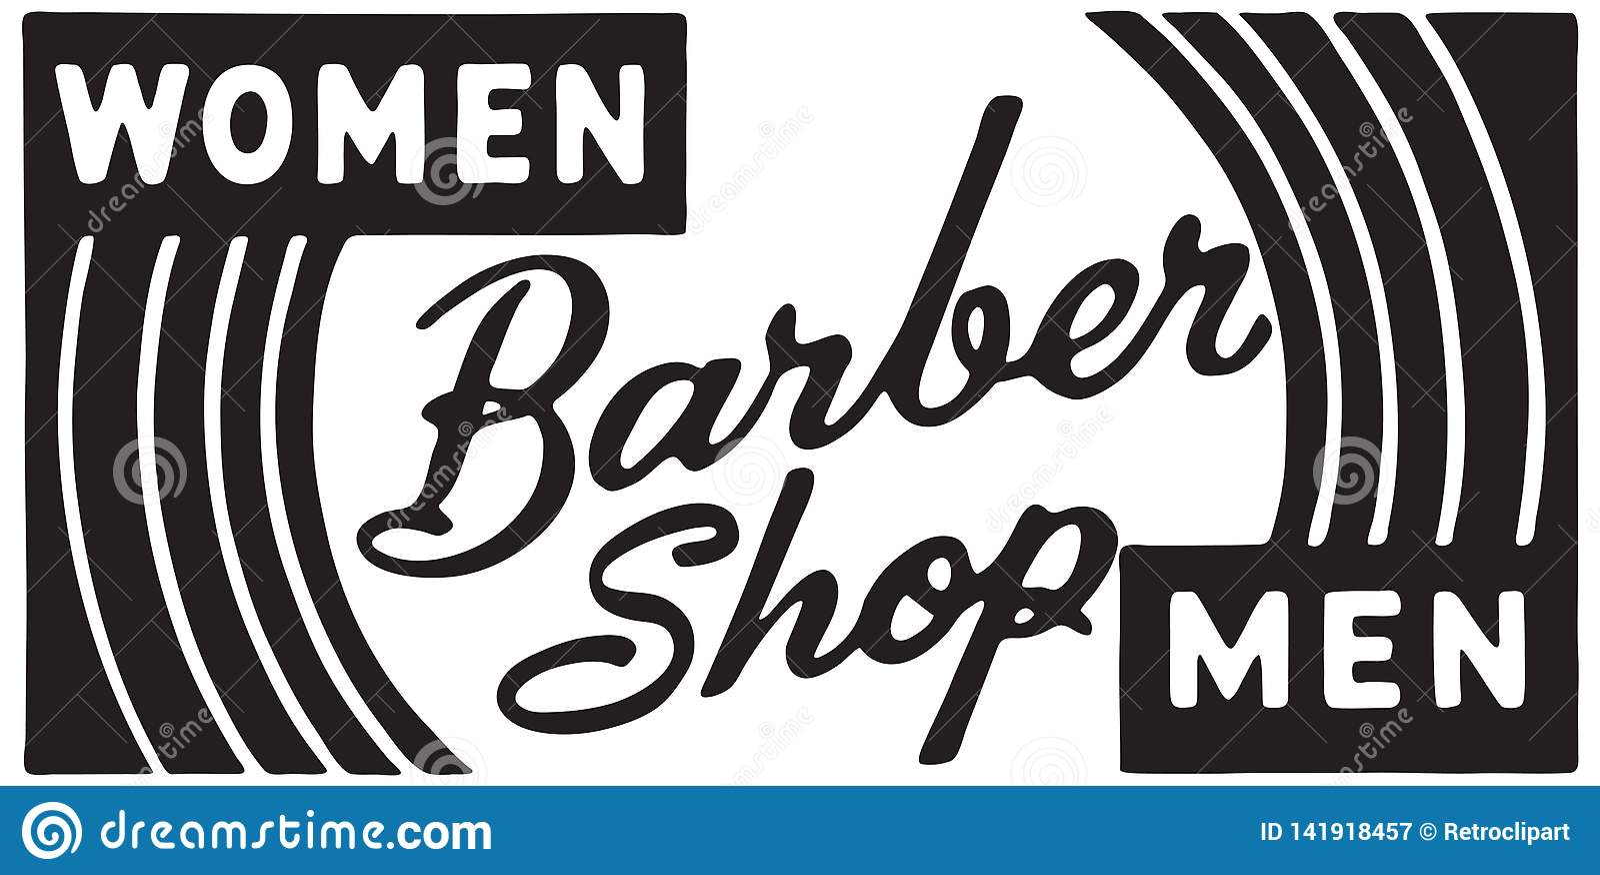 Barber Shop Women Men